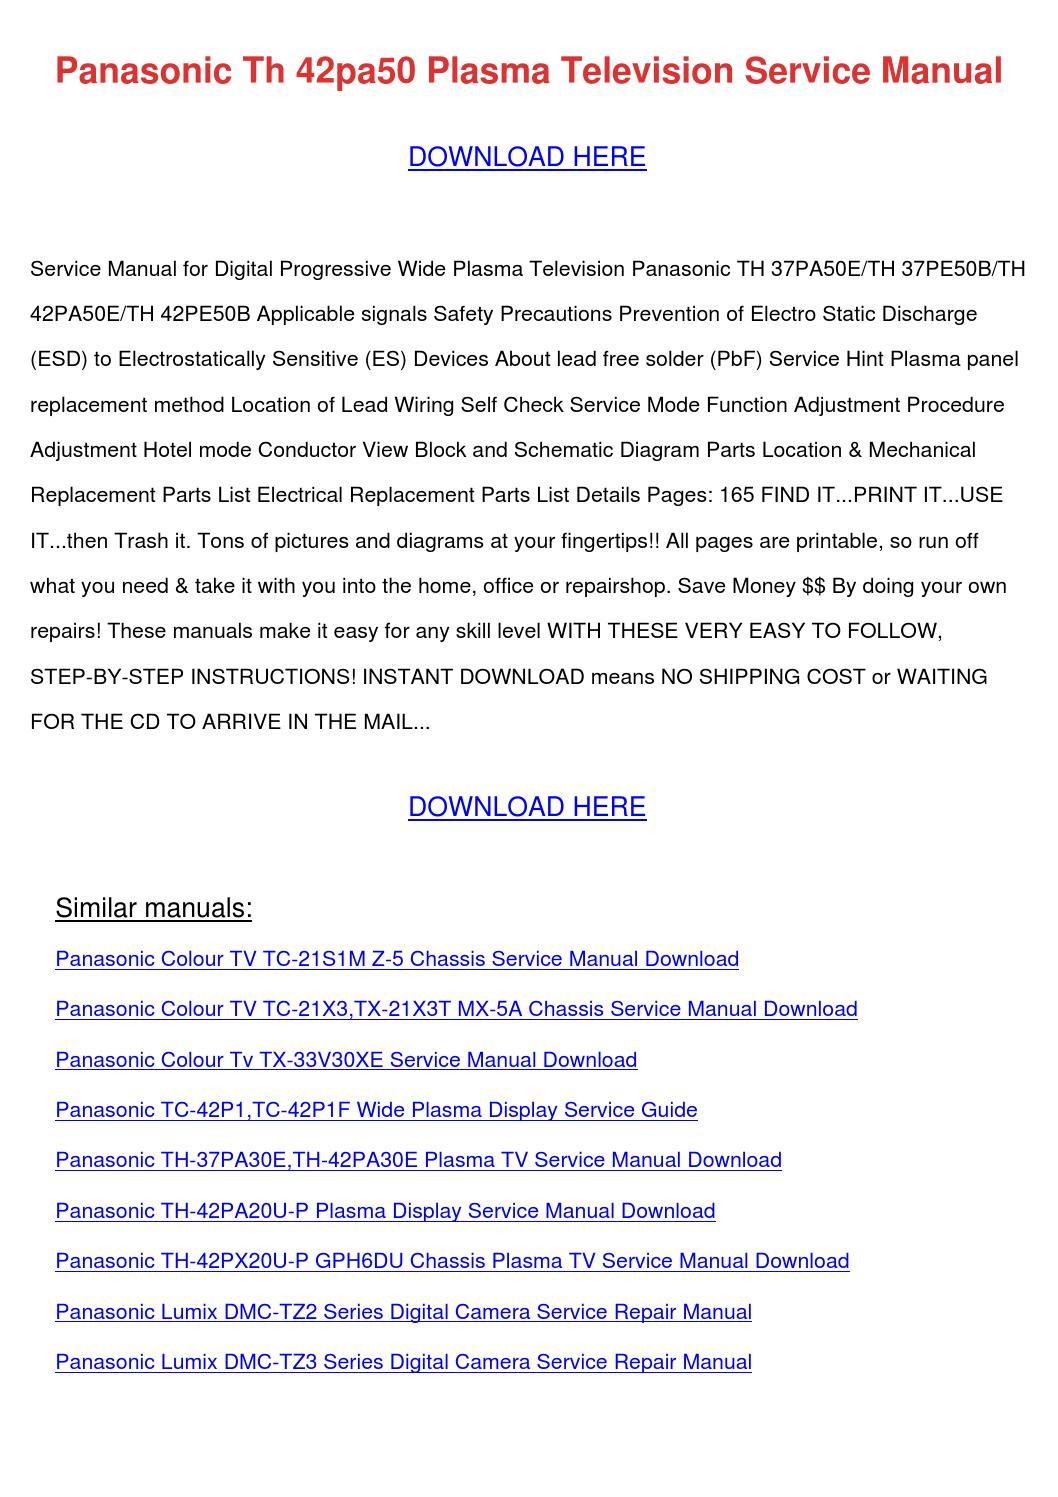 Panasonic Th 42pa50 Plasma Television Service by AlfredoWilkinson ...